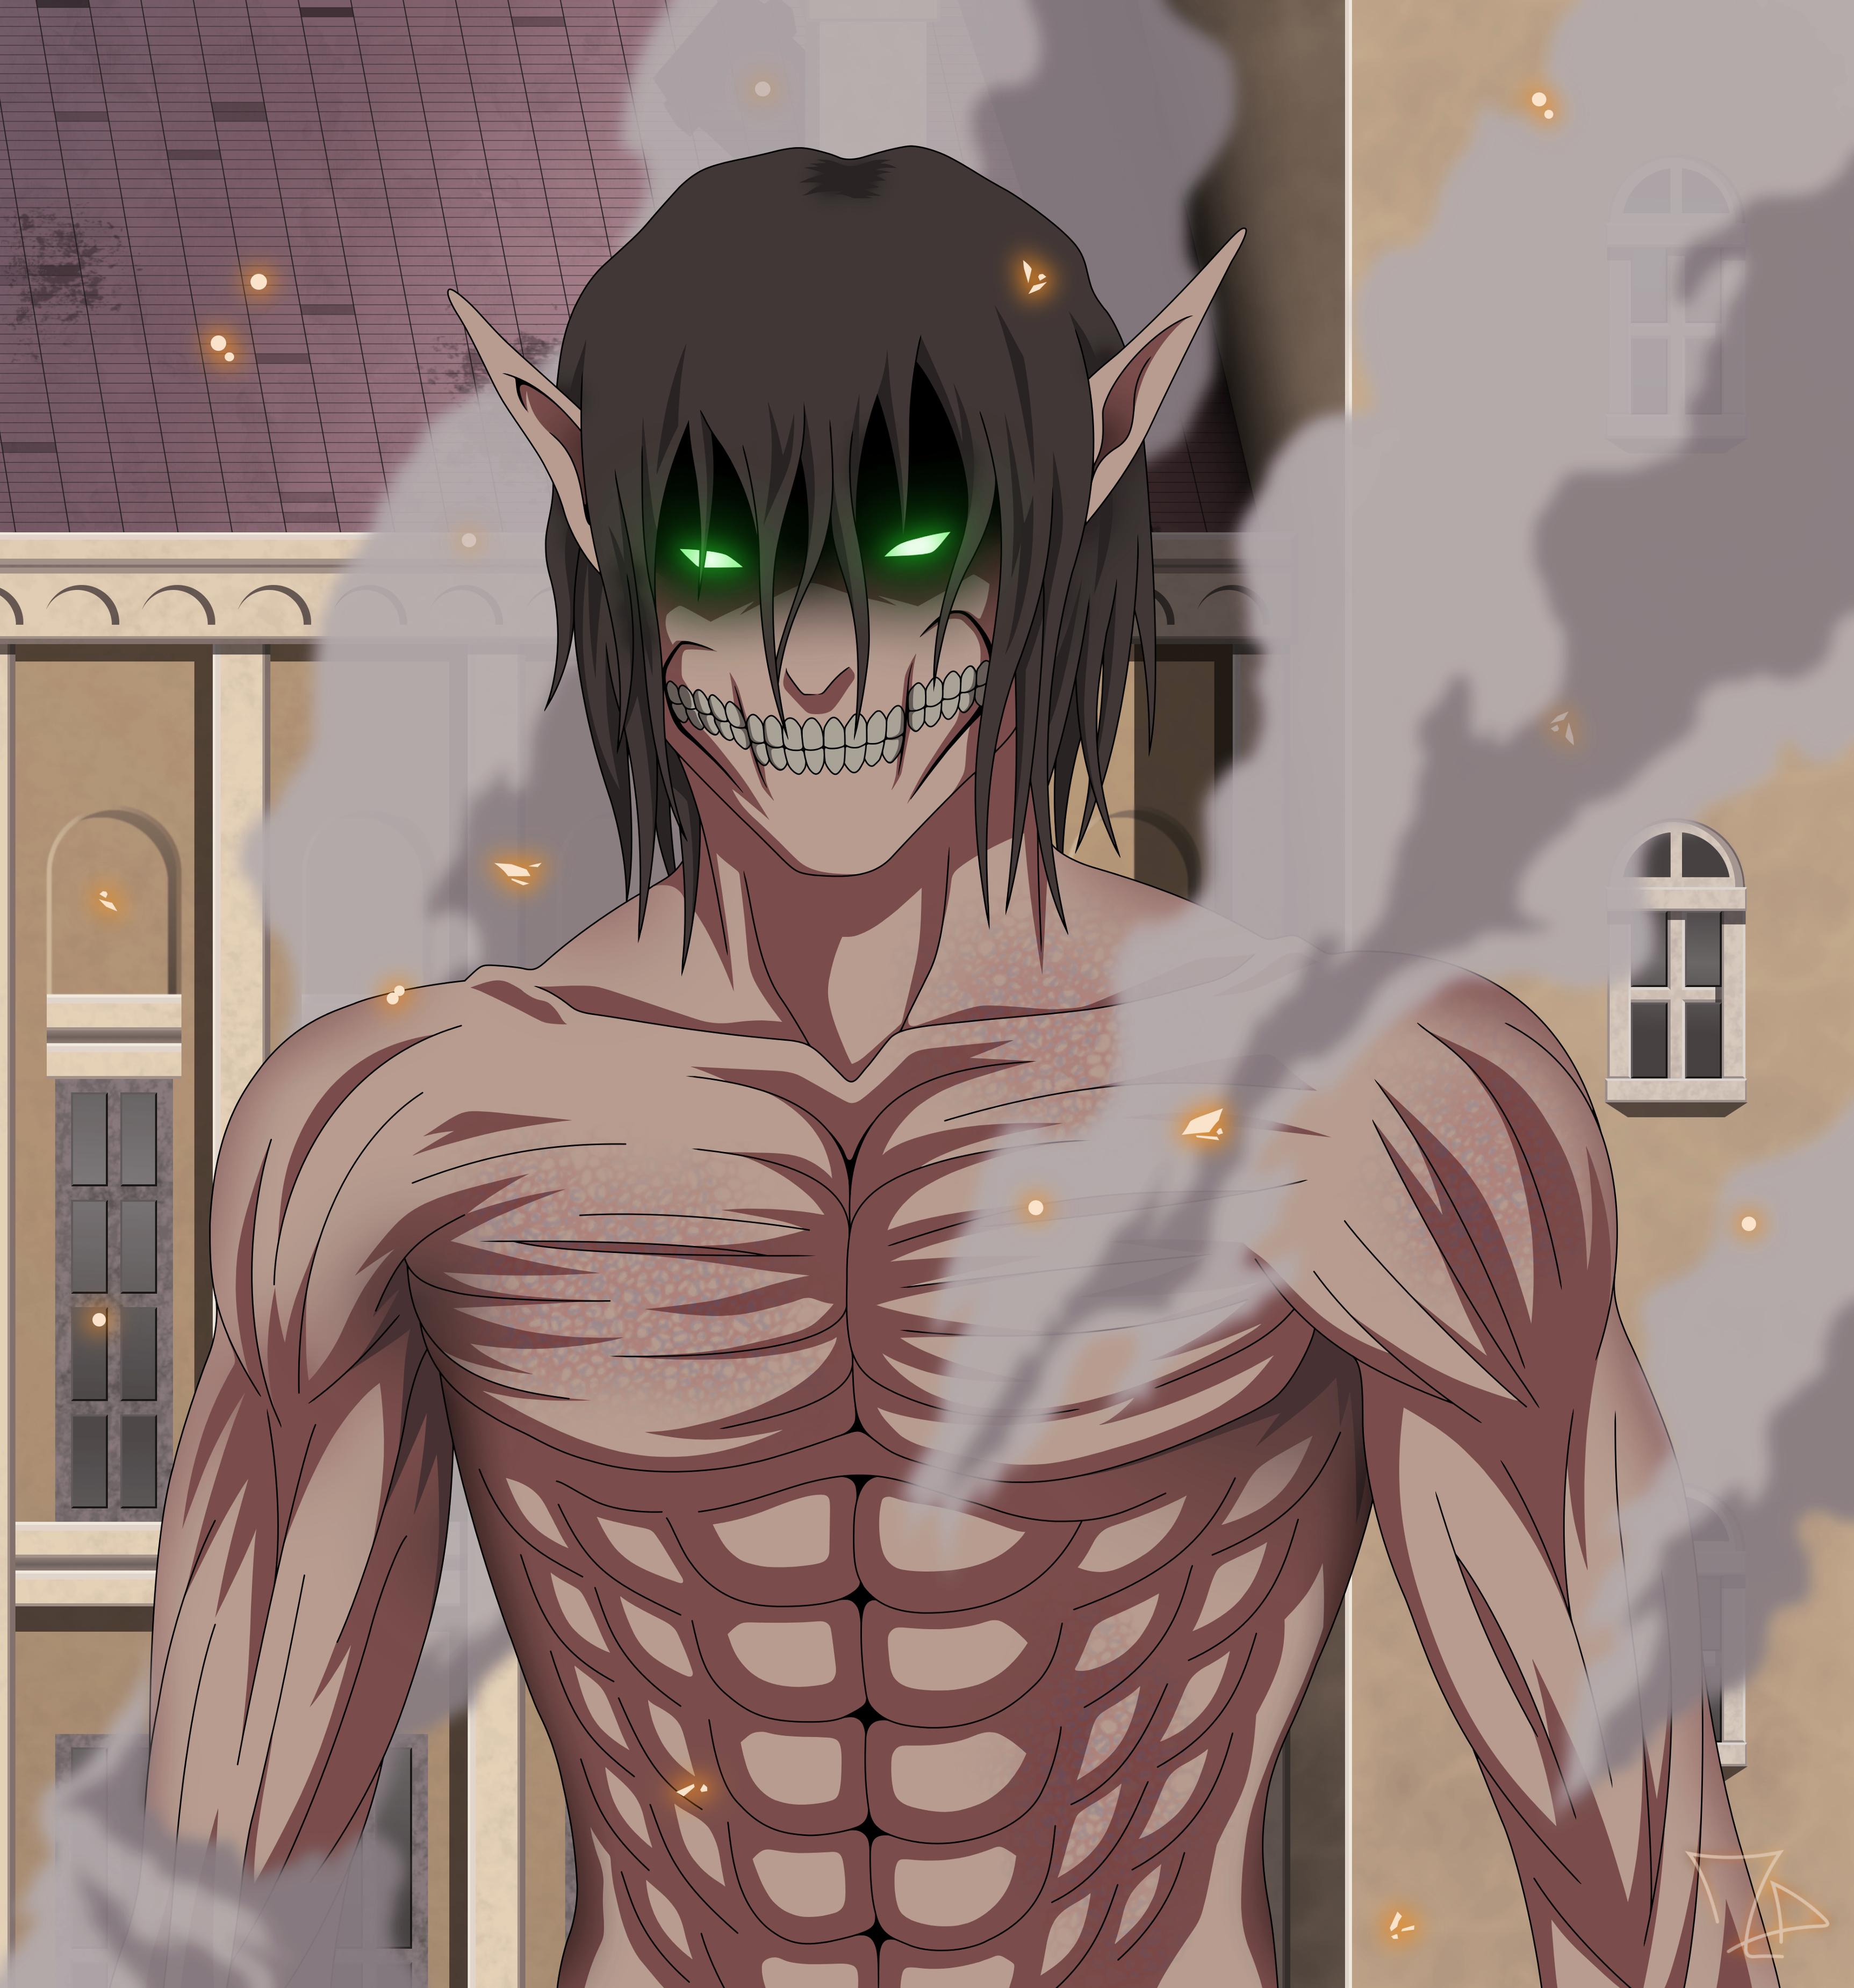 FanMade] Eren Jaeger titan form by flo94cody on DeviantArt